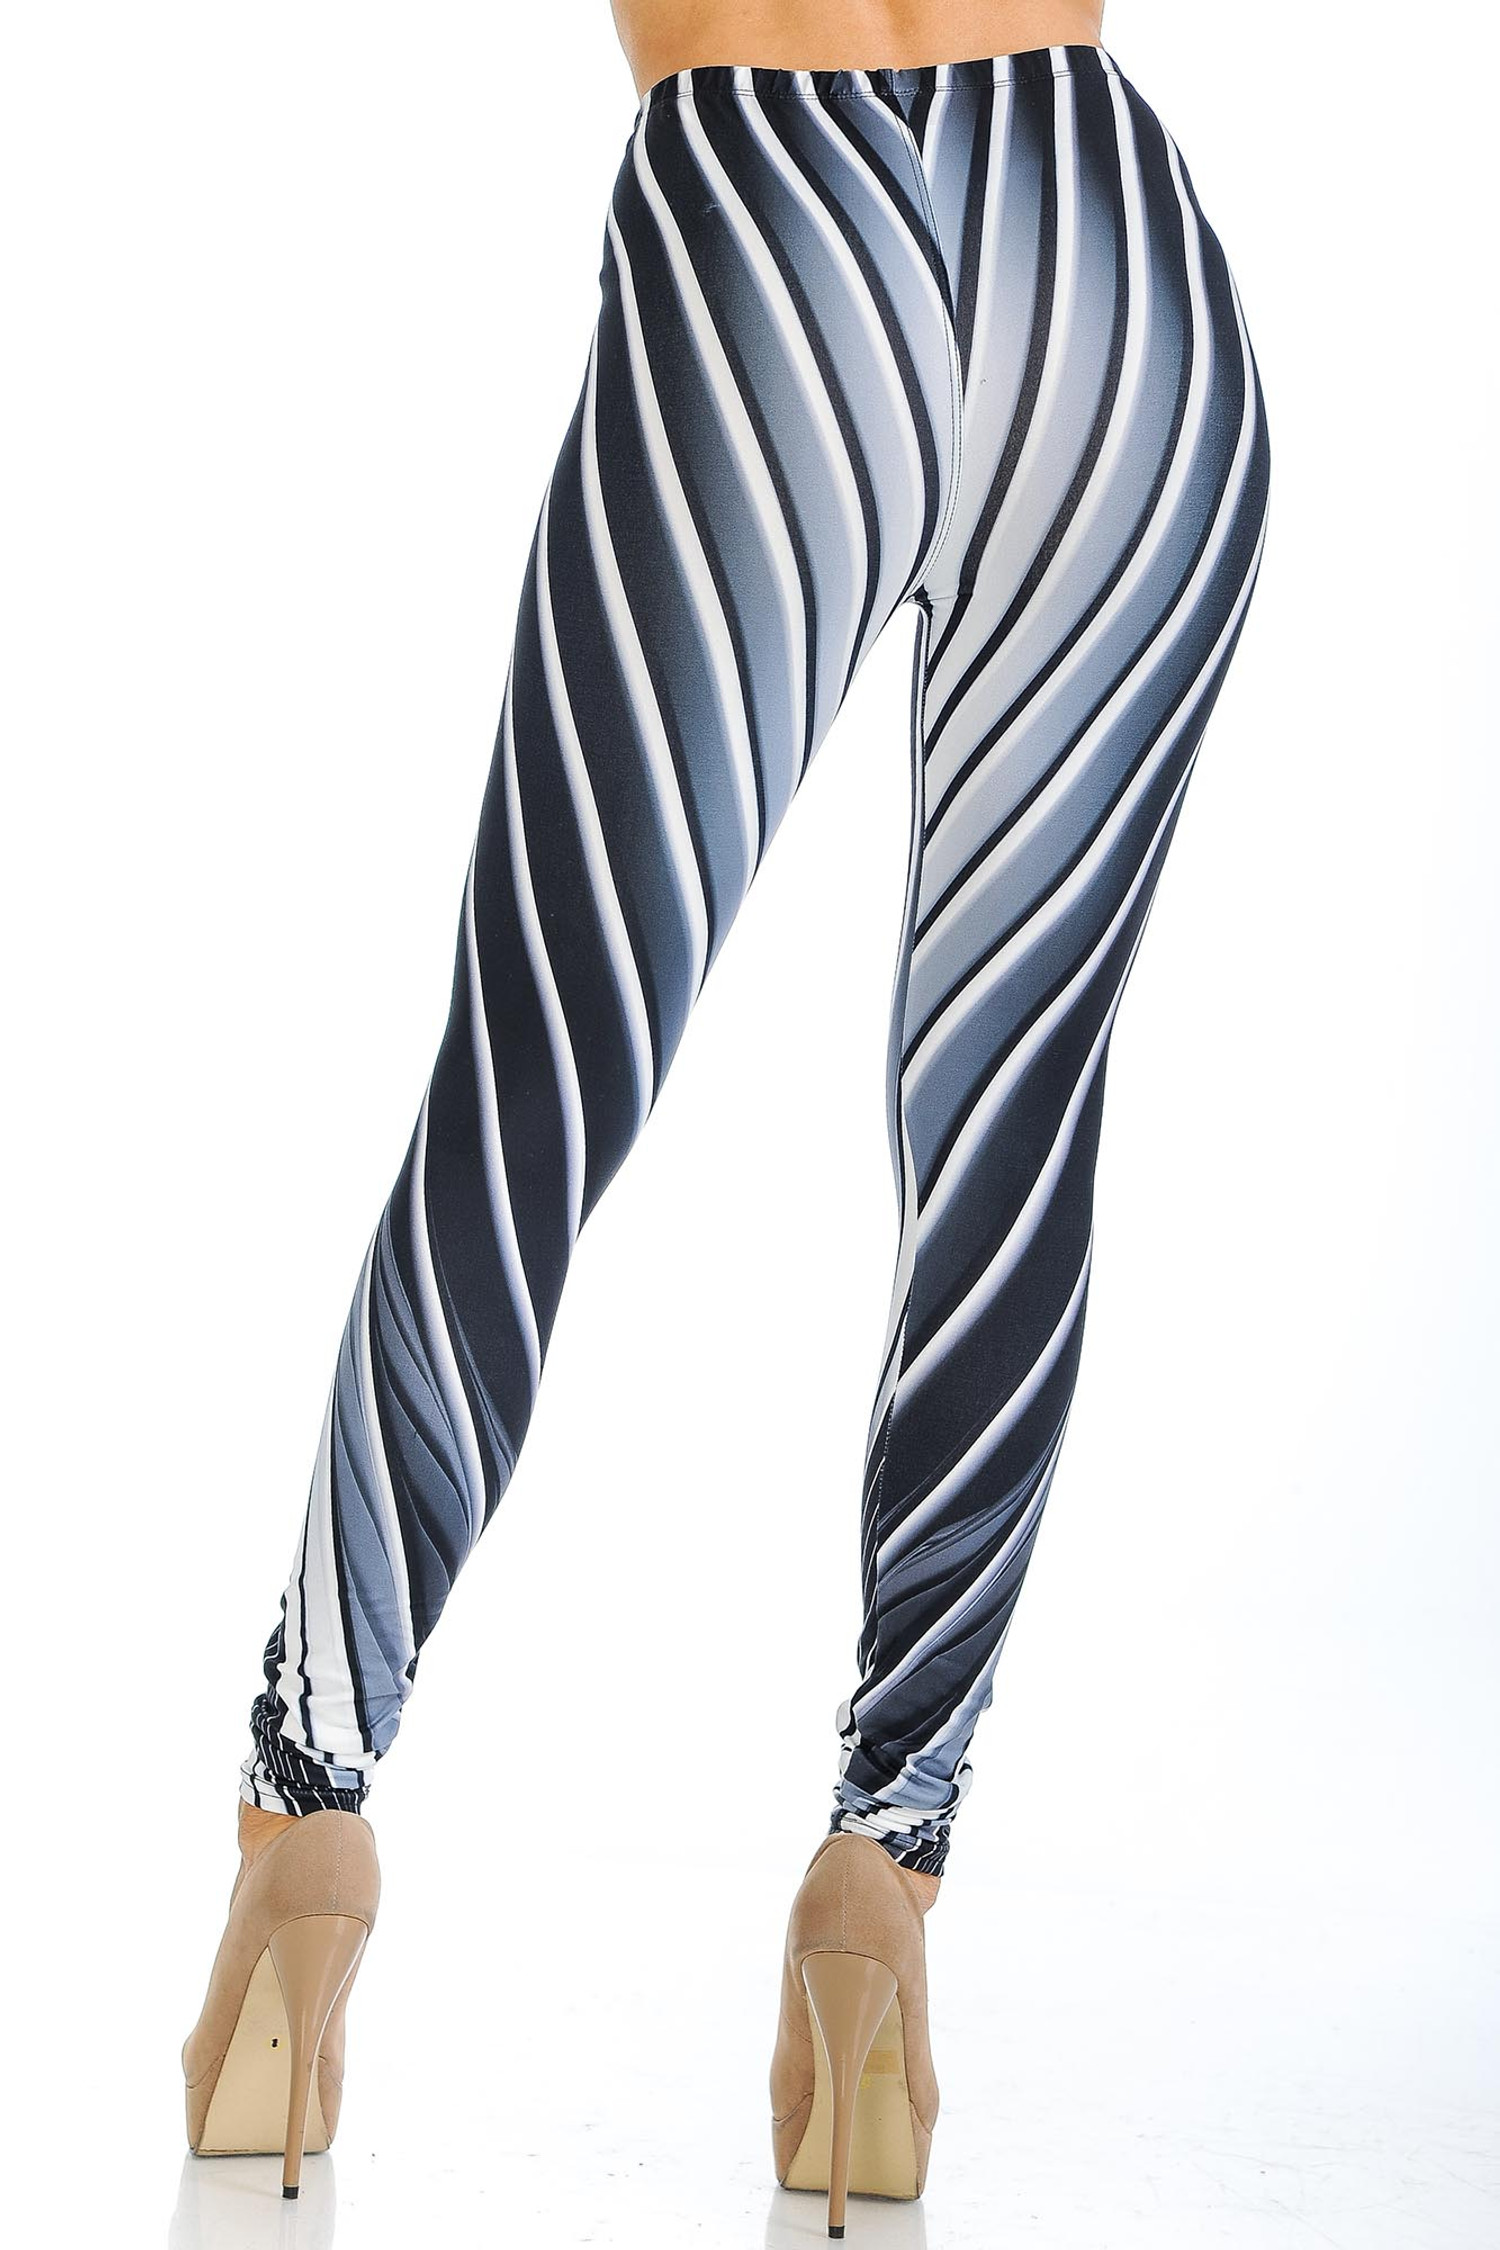 Creamy Soft Contour Body Lines Leggings - USA Fashion™